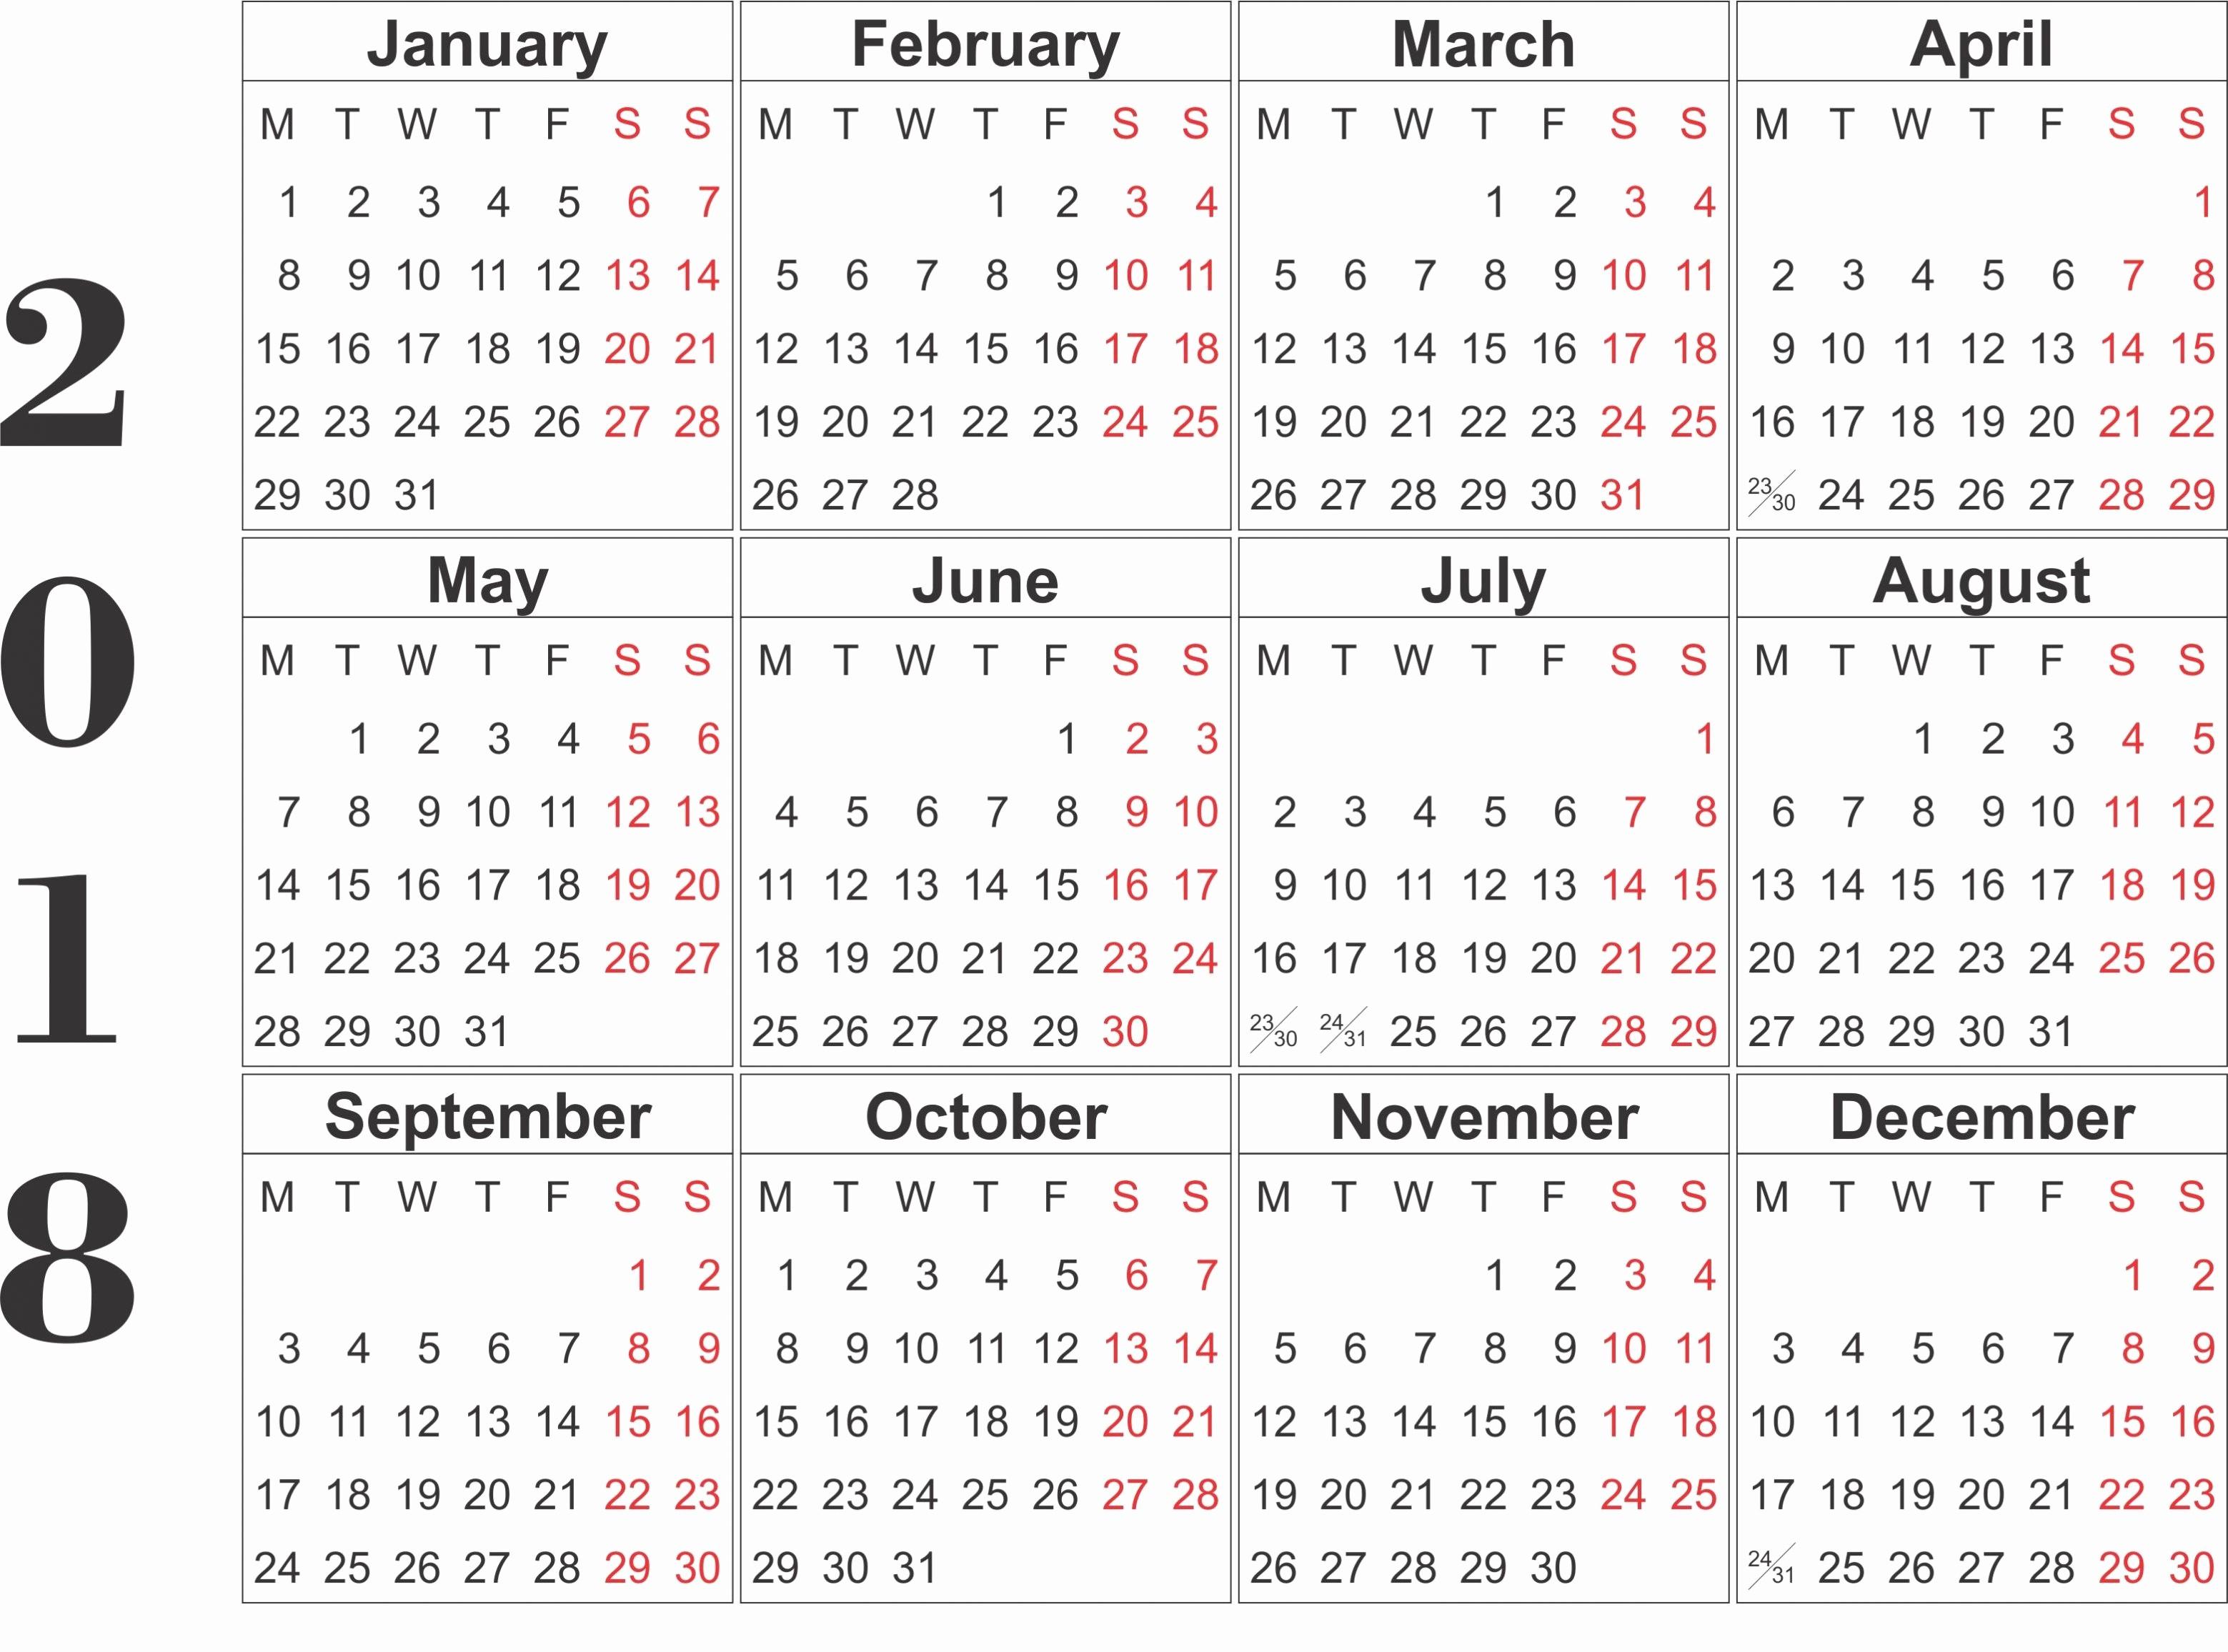 Kalender 2019 Indonesia Pdf Download Mejores Y Más Novedosos Luxury 15 Examples 2018 Calendar Of Kalender 2019 Indonesia Pdf Download Más Reciente Pdf Kalender 2019 2020 Bayern Dreijahreskalender 2018 2019 2020 Als